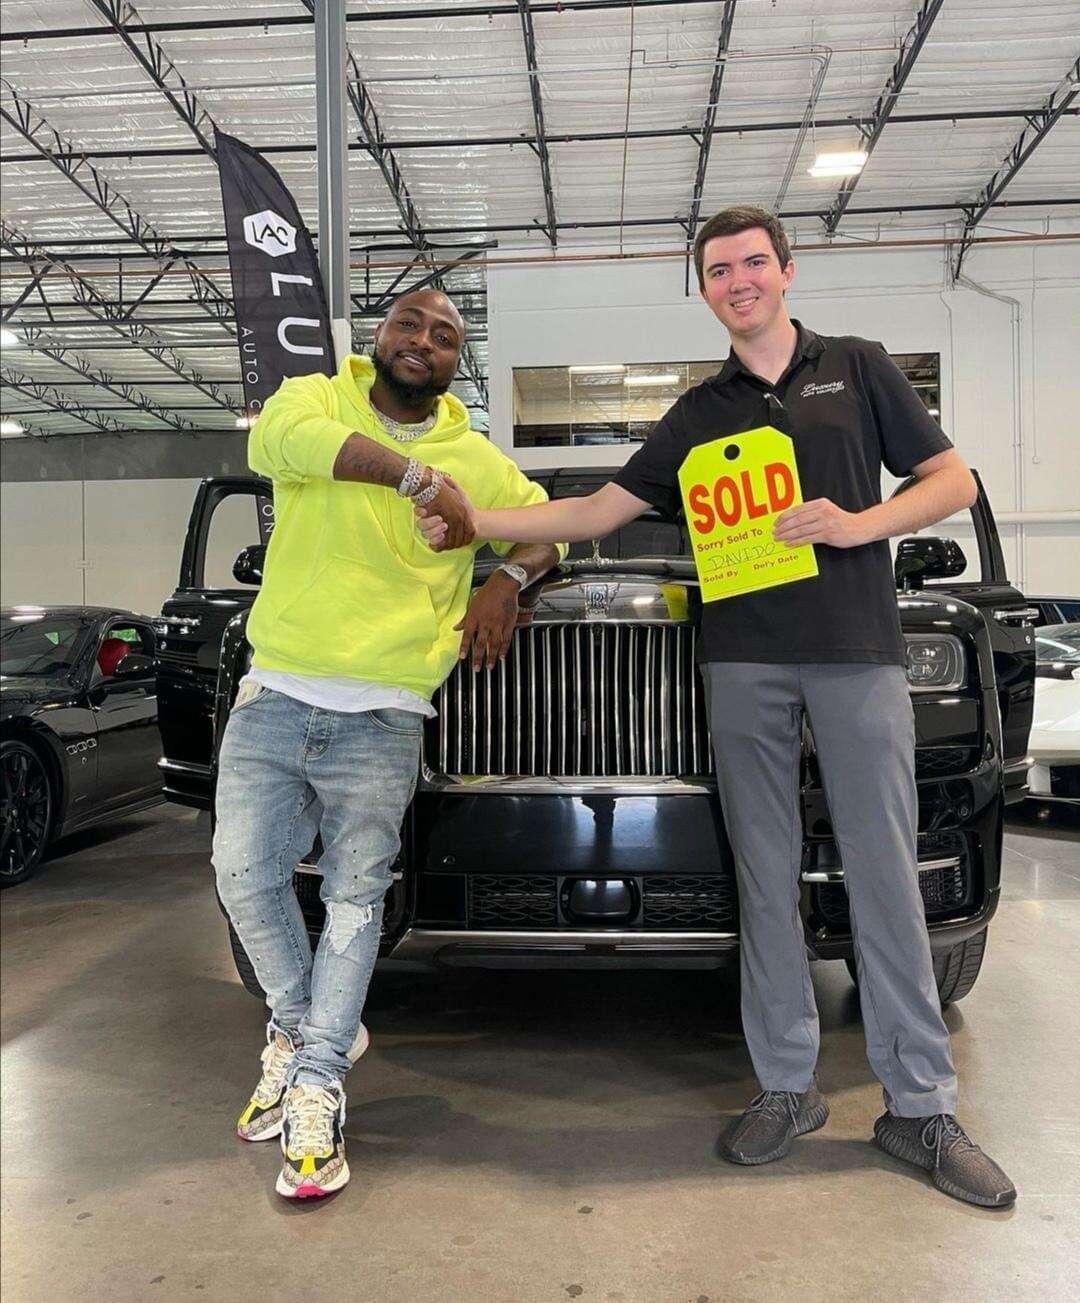 Davido gifts self Brand new 2021 Rolls Royce (Photos & Video)